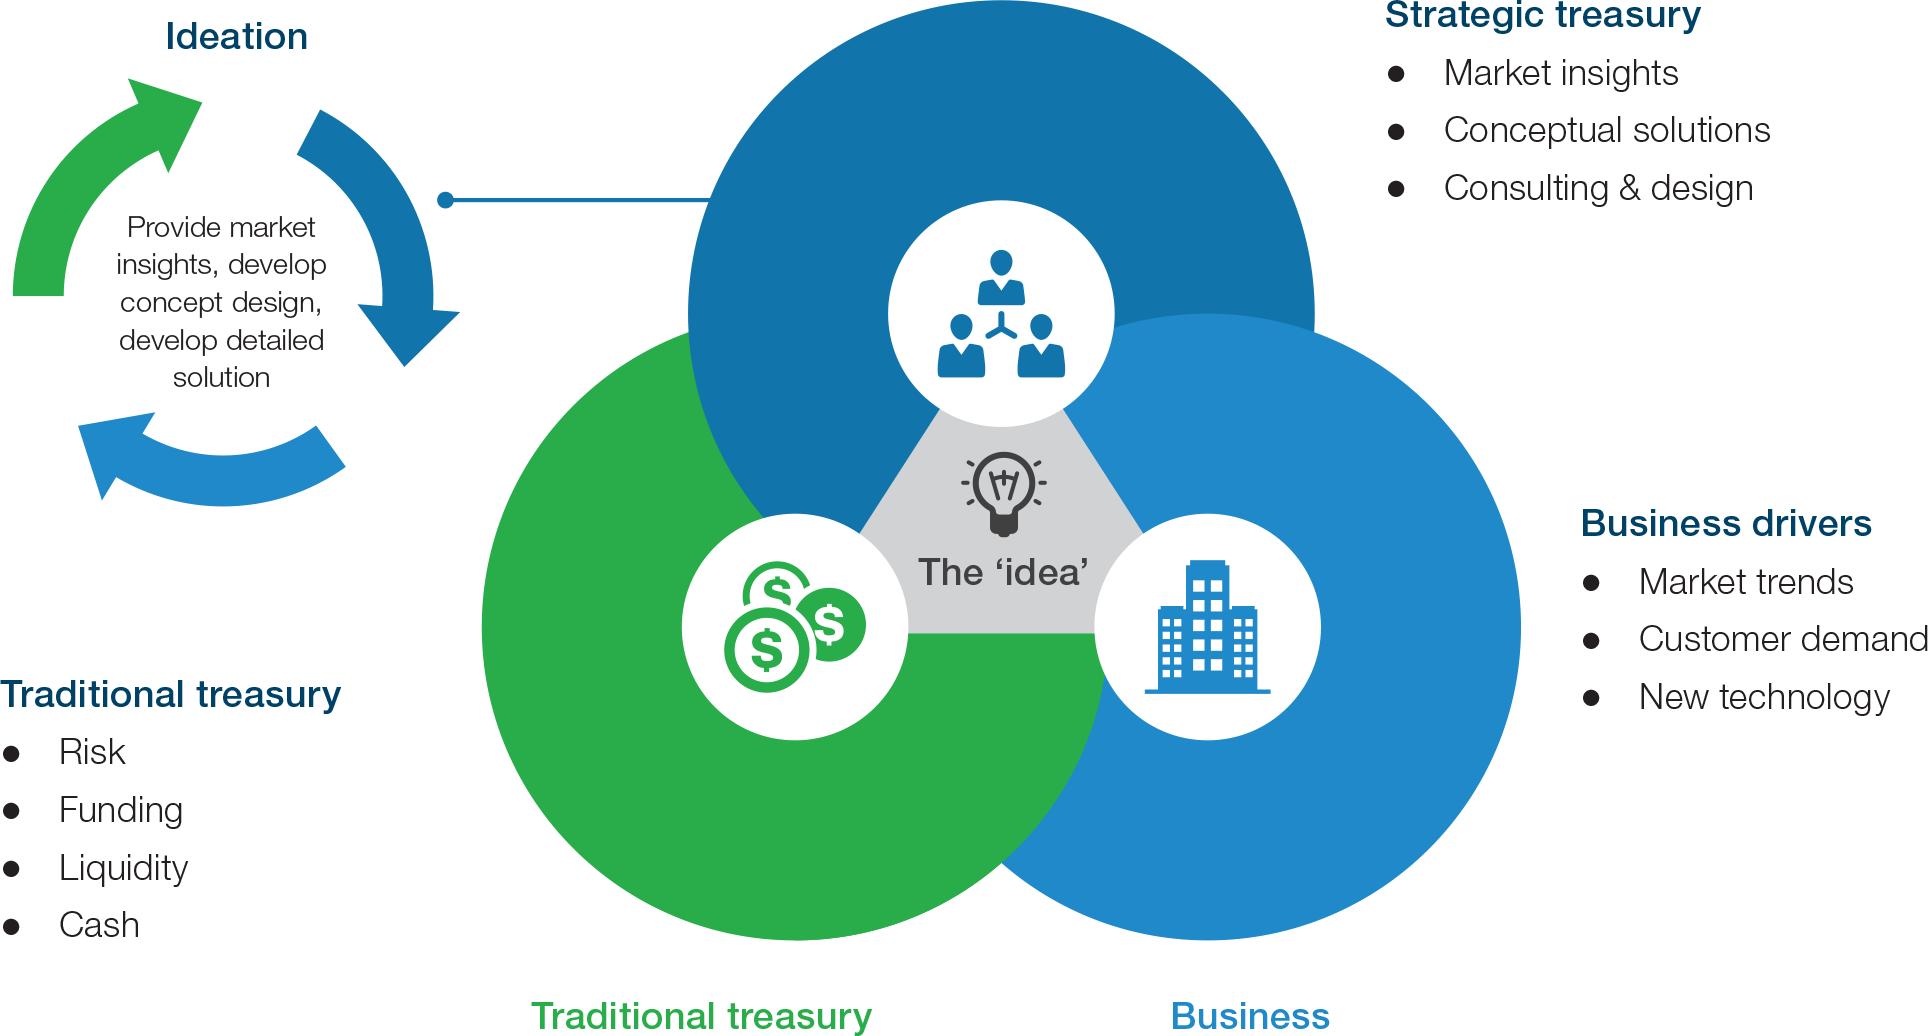 Diagram 1: Strategic treasury, traditional treasury and business drivers